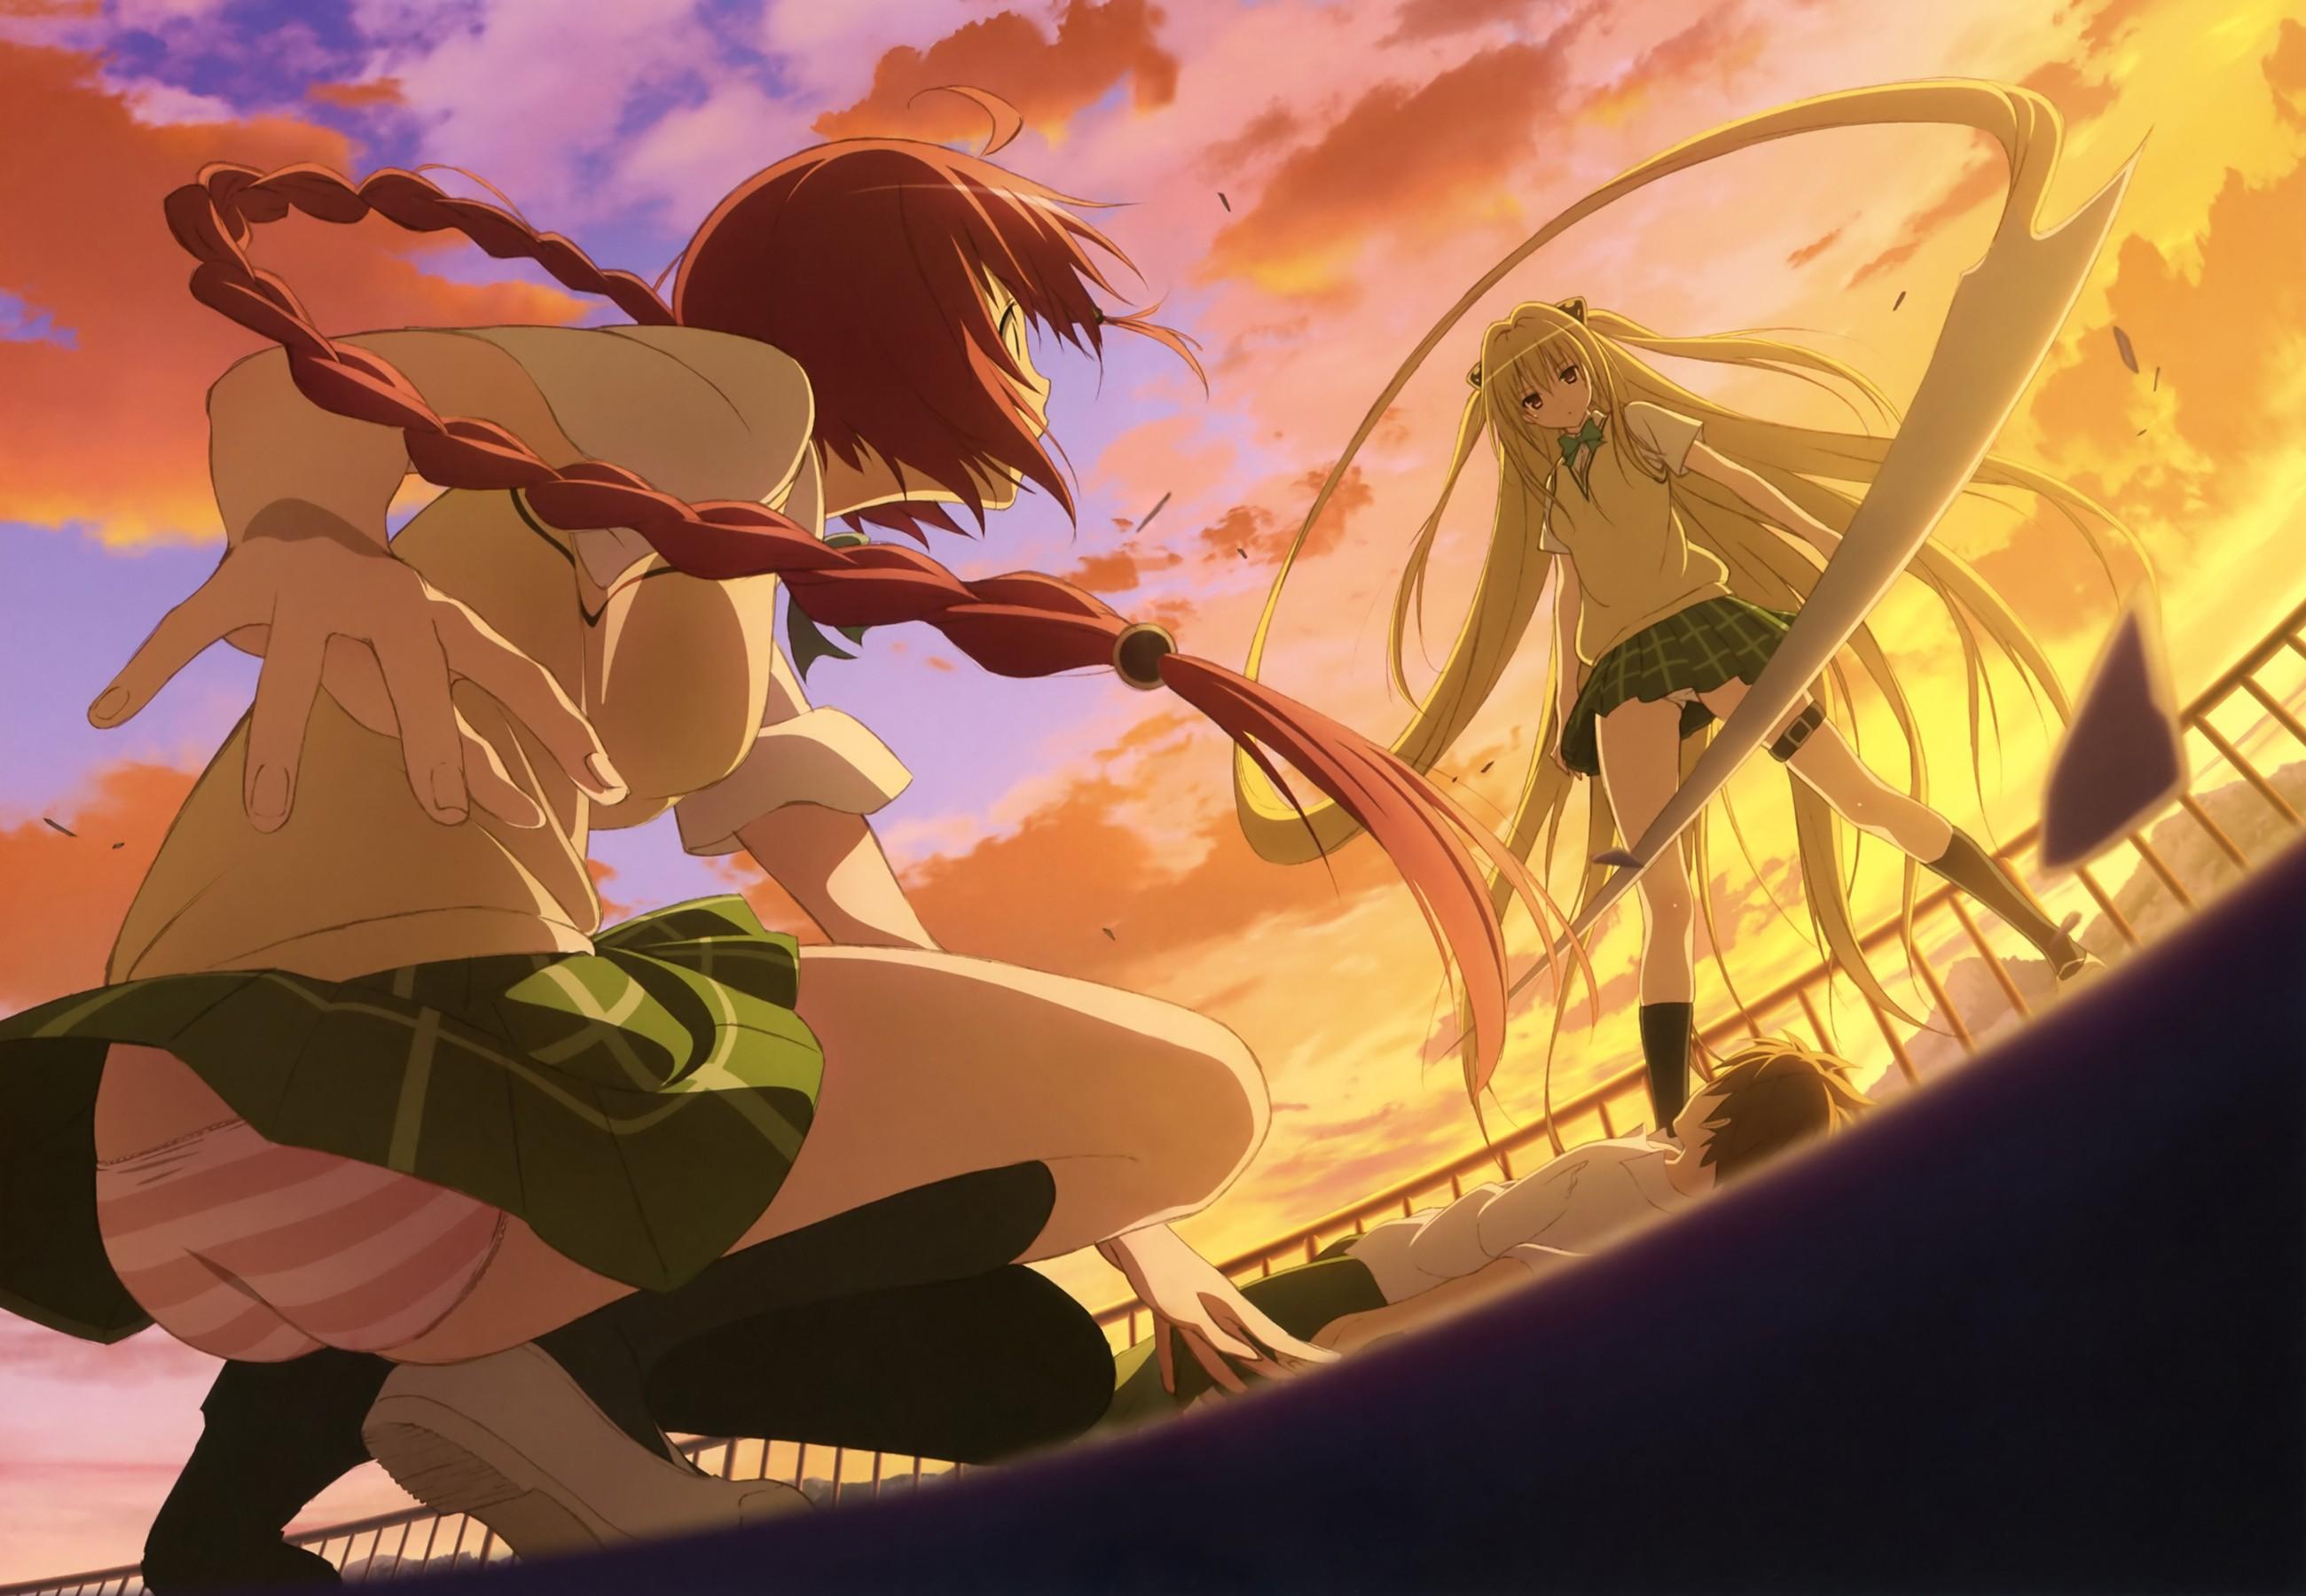 Wallpaper Illustration Anime Girls To Love Ru Golden Darkness